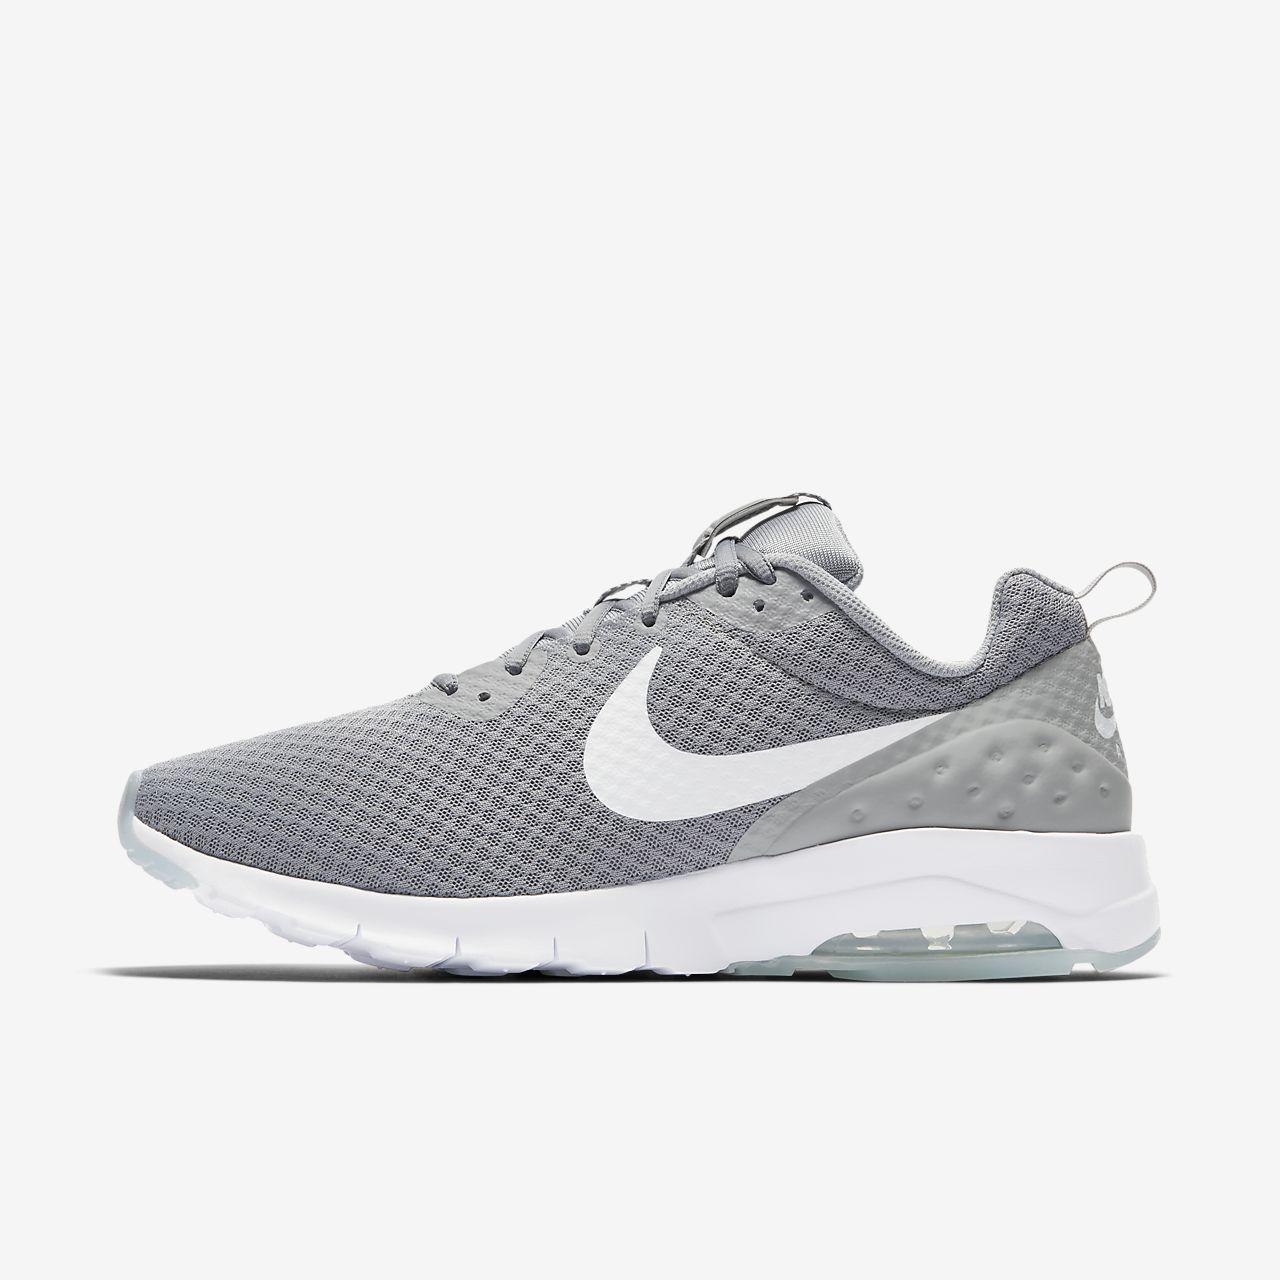 Nike Air Max Motion Low férficipő